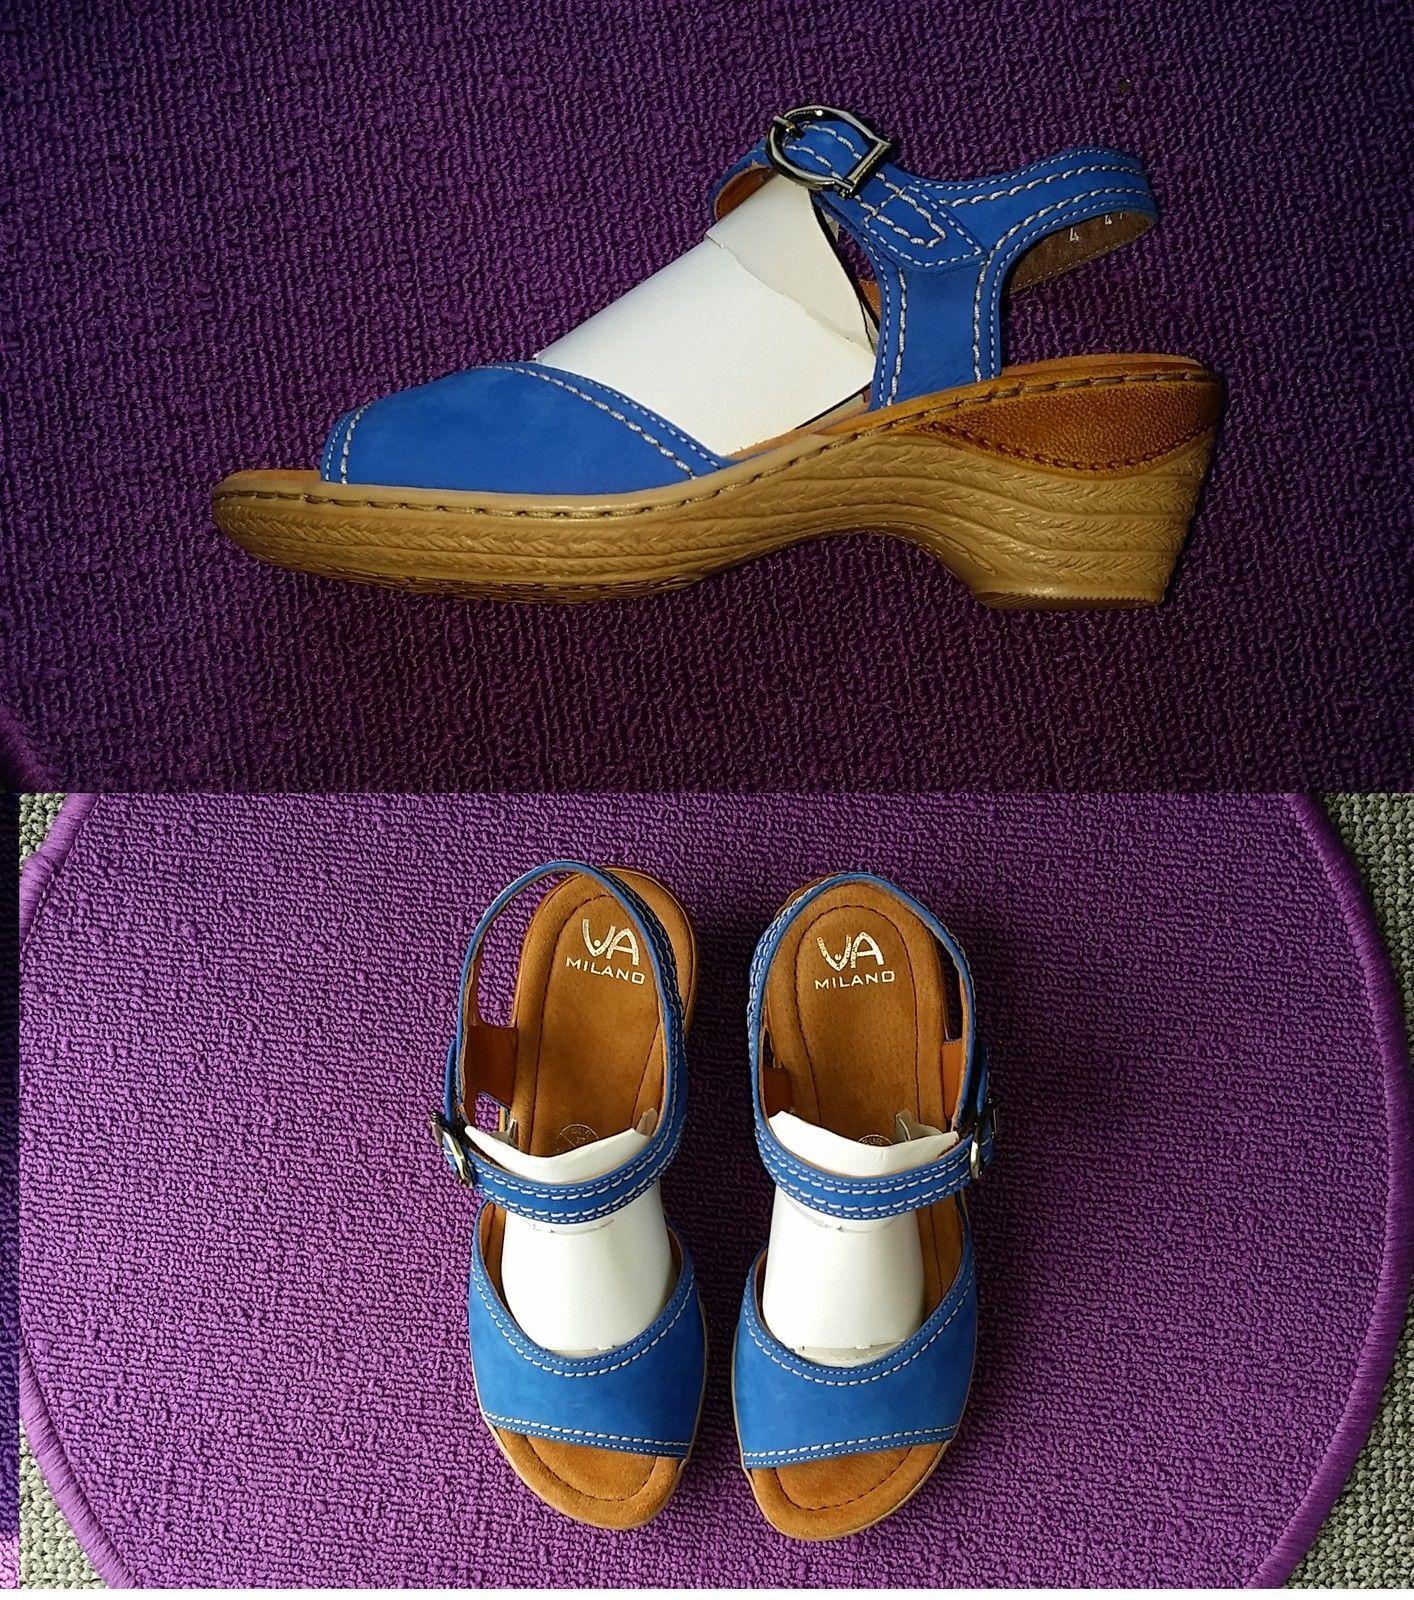 Via Milano 3,5 Sandali Cinturino Sandali circa 3,5 Milano CM, paragrafo colore blu chiaro UVP: 42175d